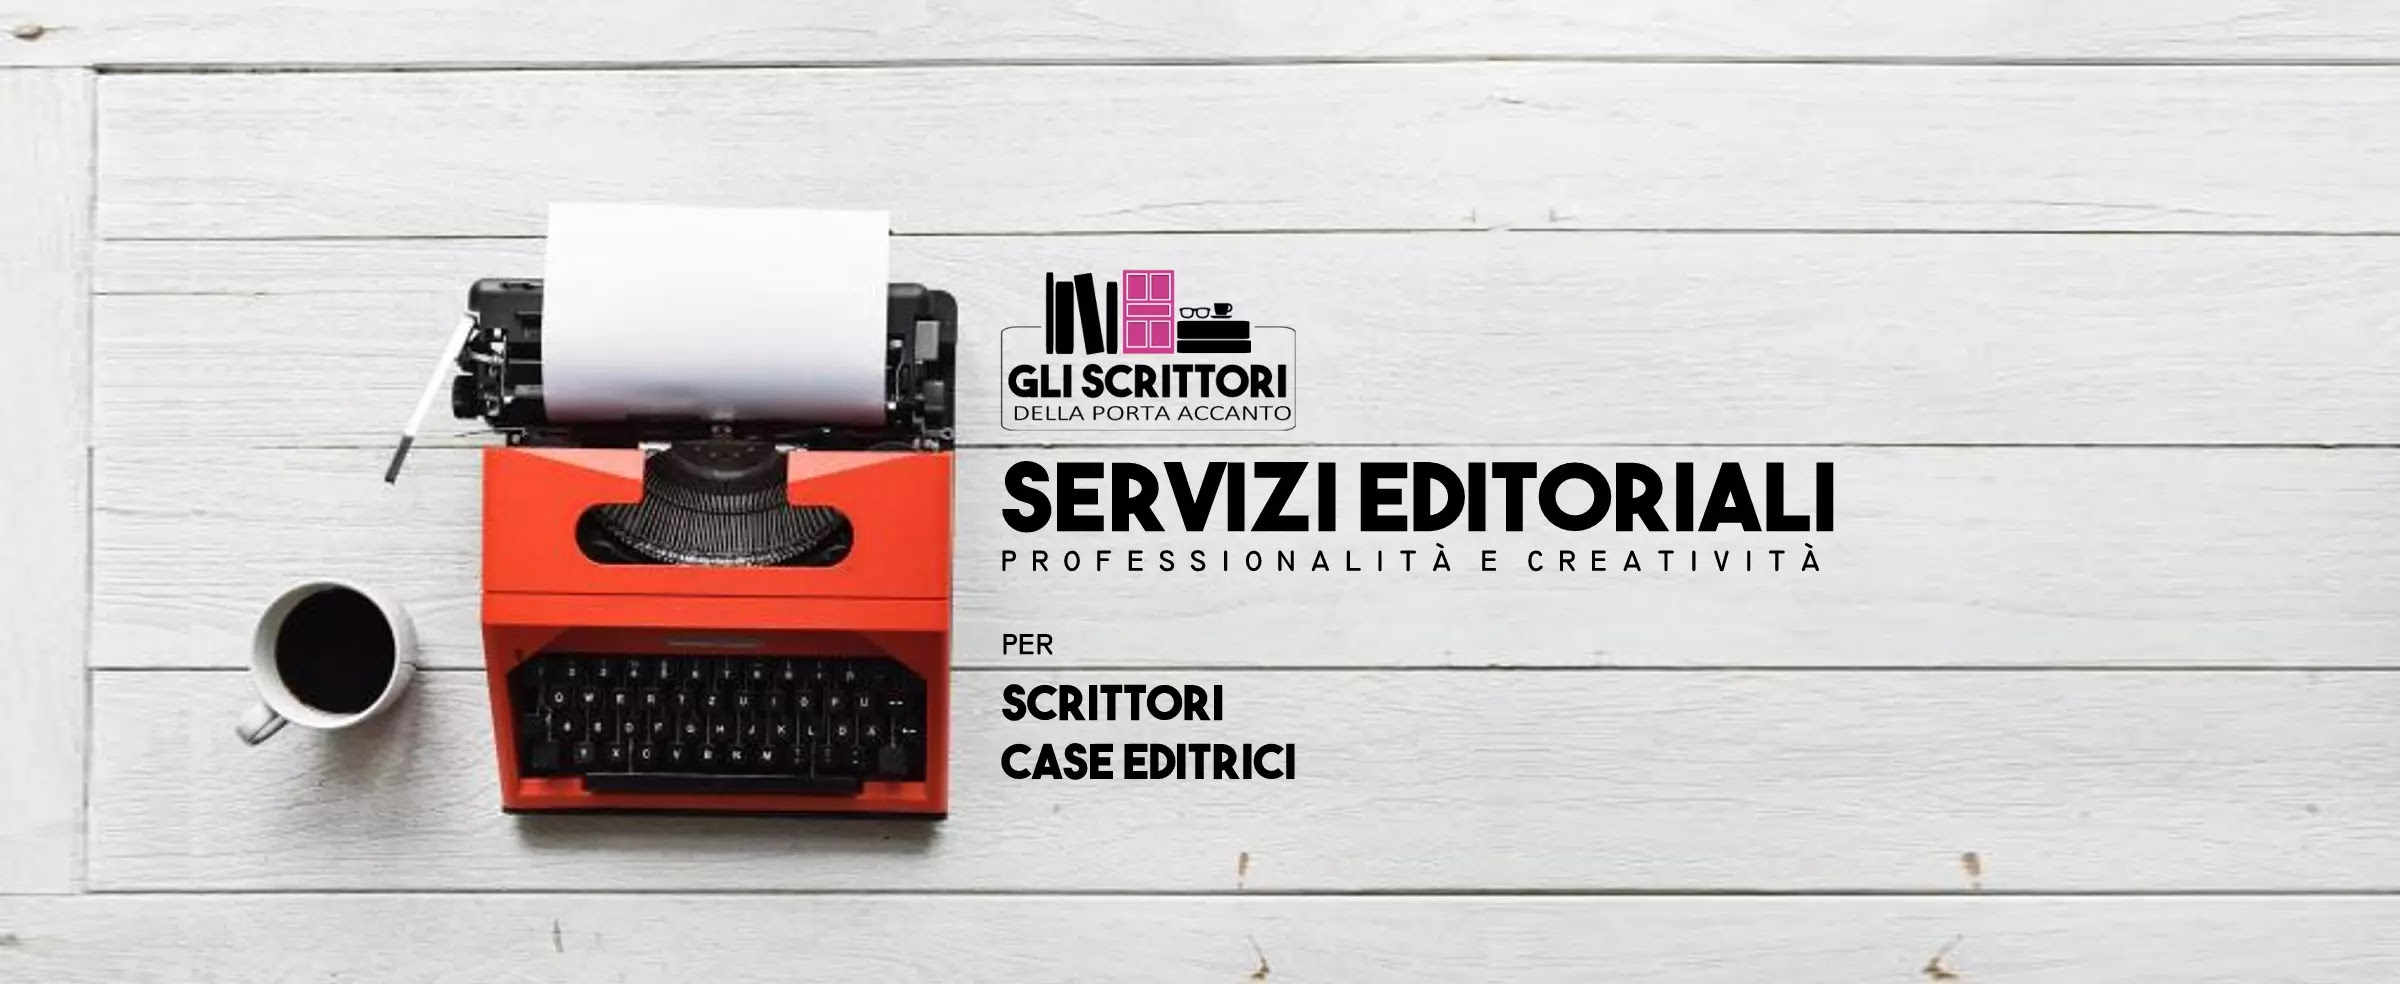 Servizi editoriali | Creazione ebook e impaginazione cartaceo